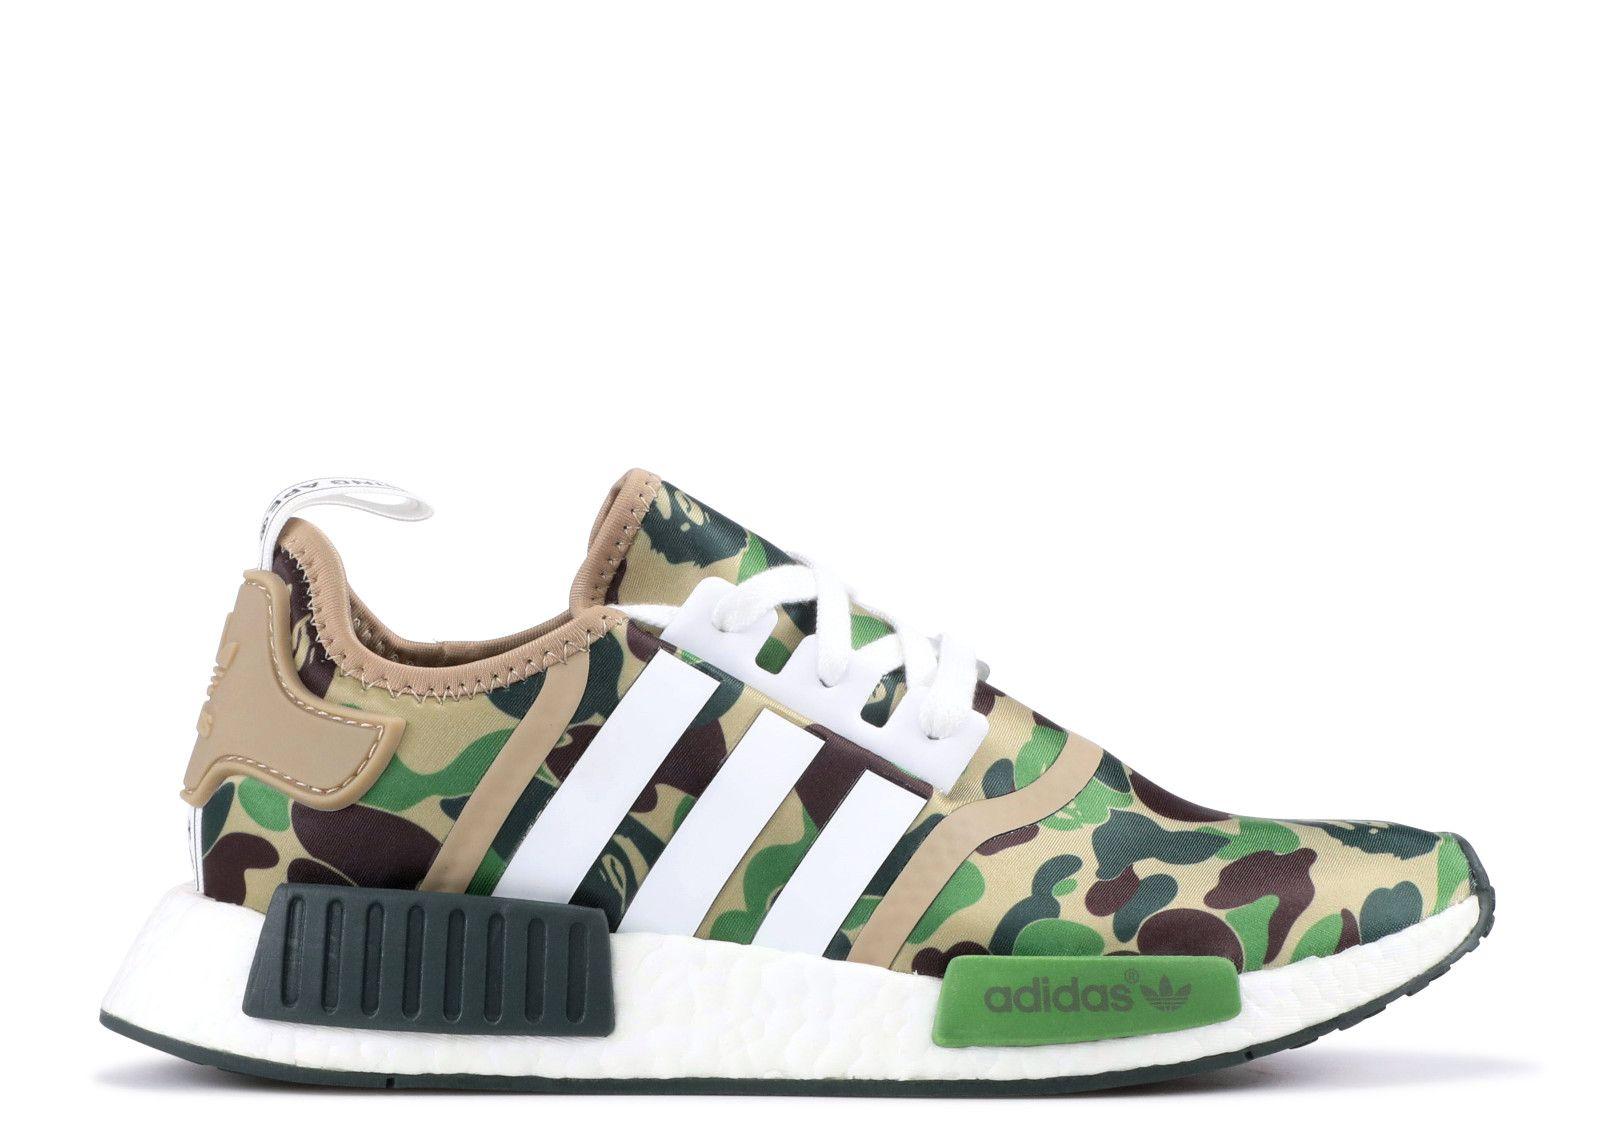 adidas ultra stivali camo green